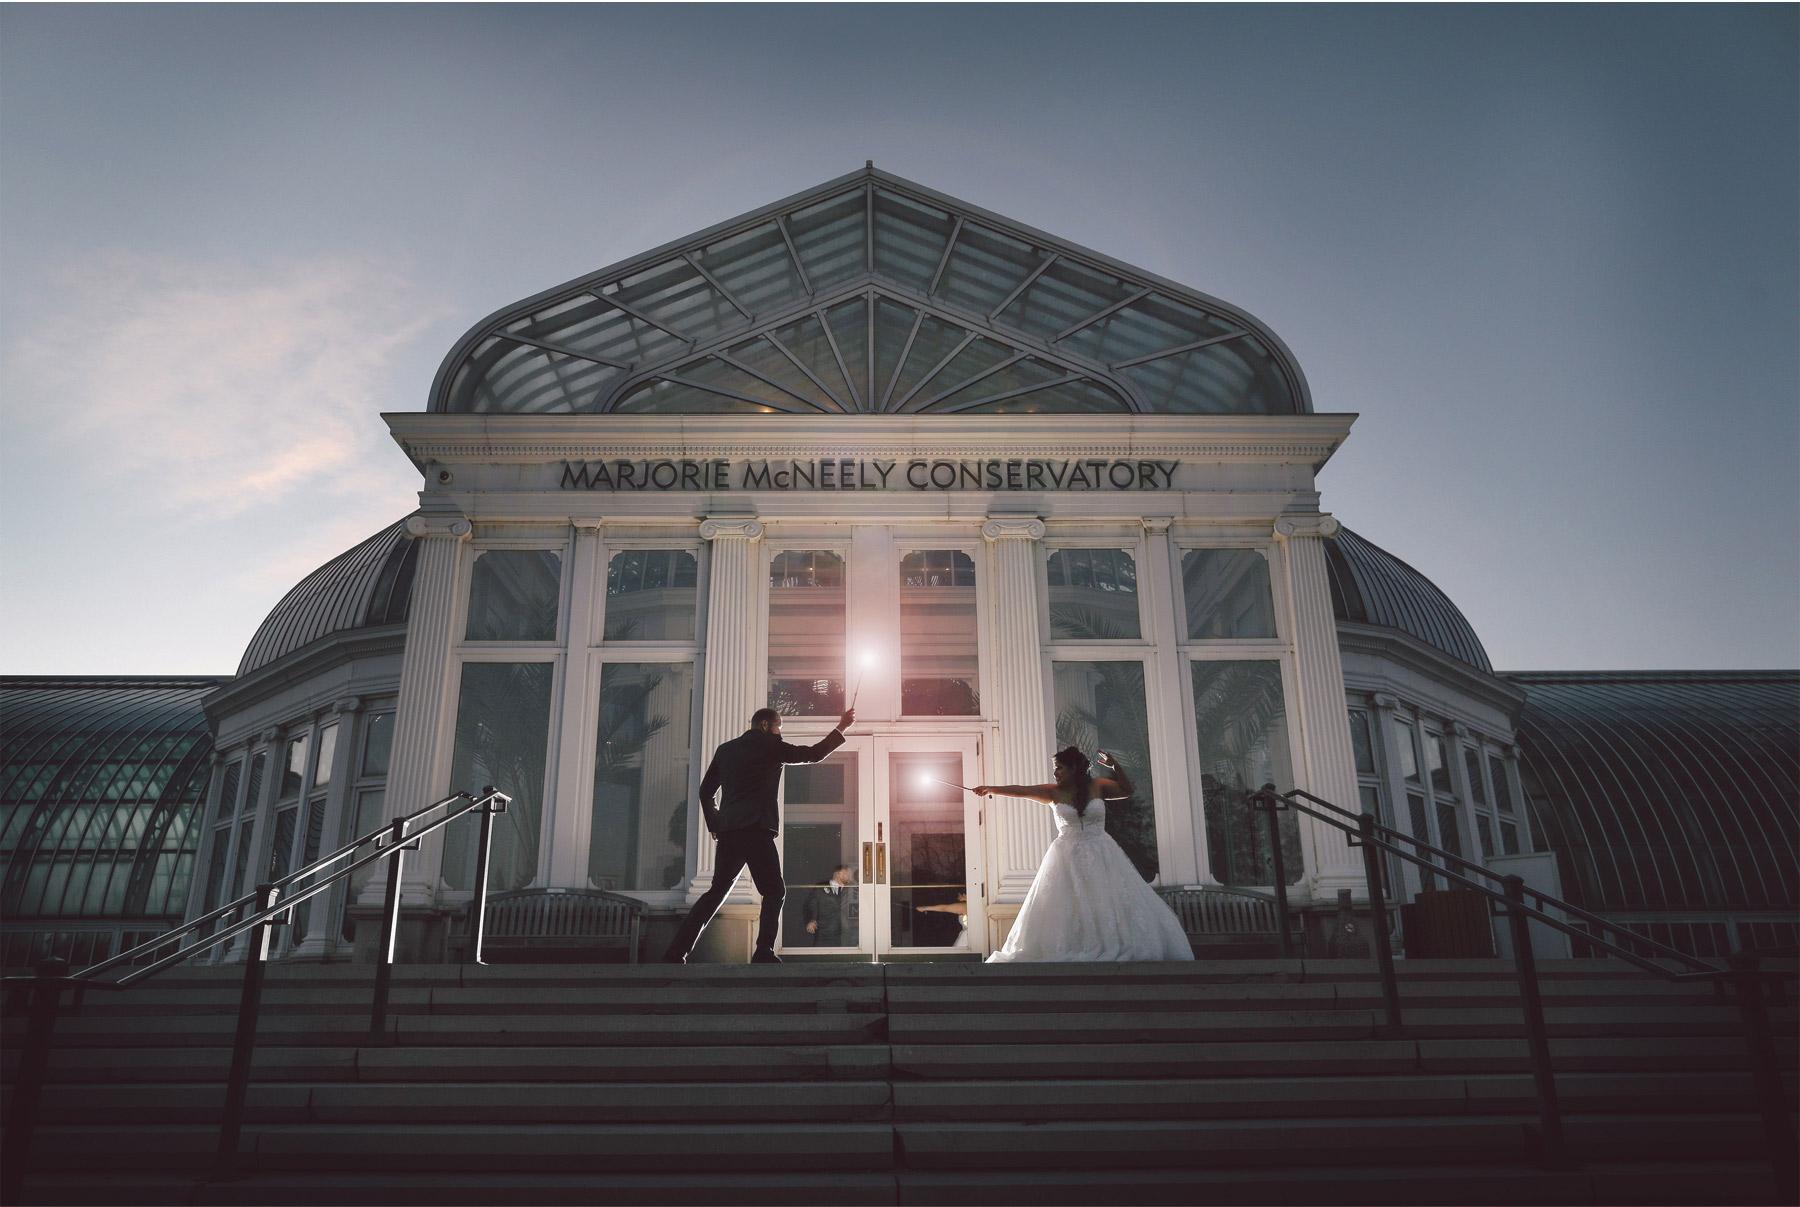 17-Saint-Paul-Minnesota-Wedding-Photography-by-Vick-Photography-Como-Park-Conservatory-Harry-Potter-Themed-Wedding-Wands-Bride-Groom-Elena-and-Doug.jpg